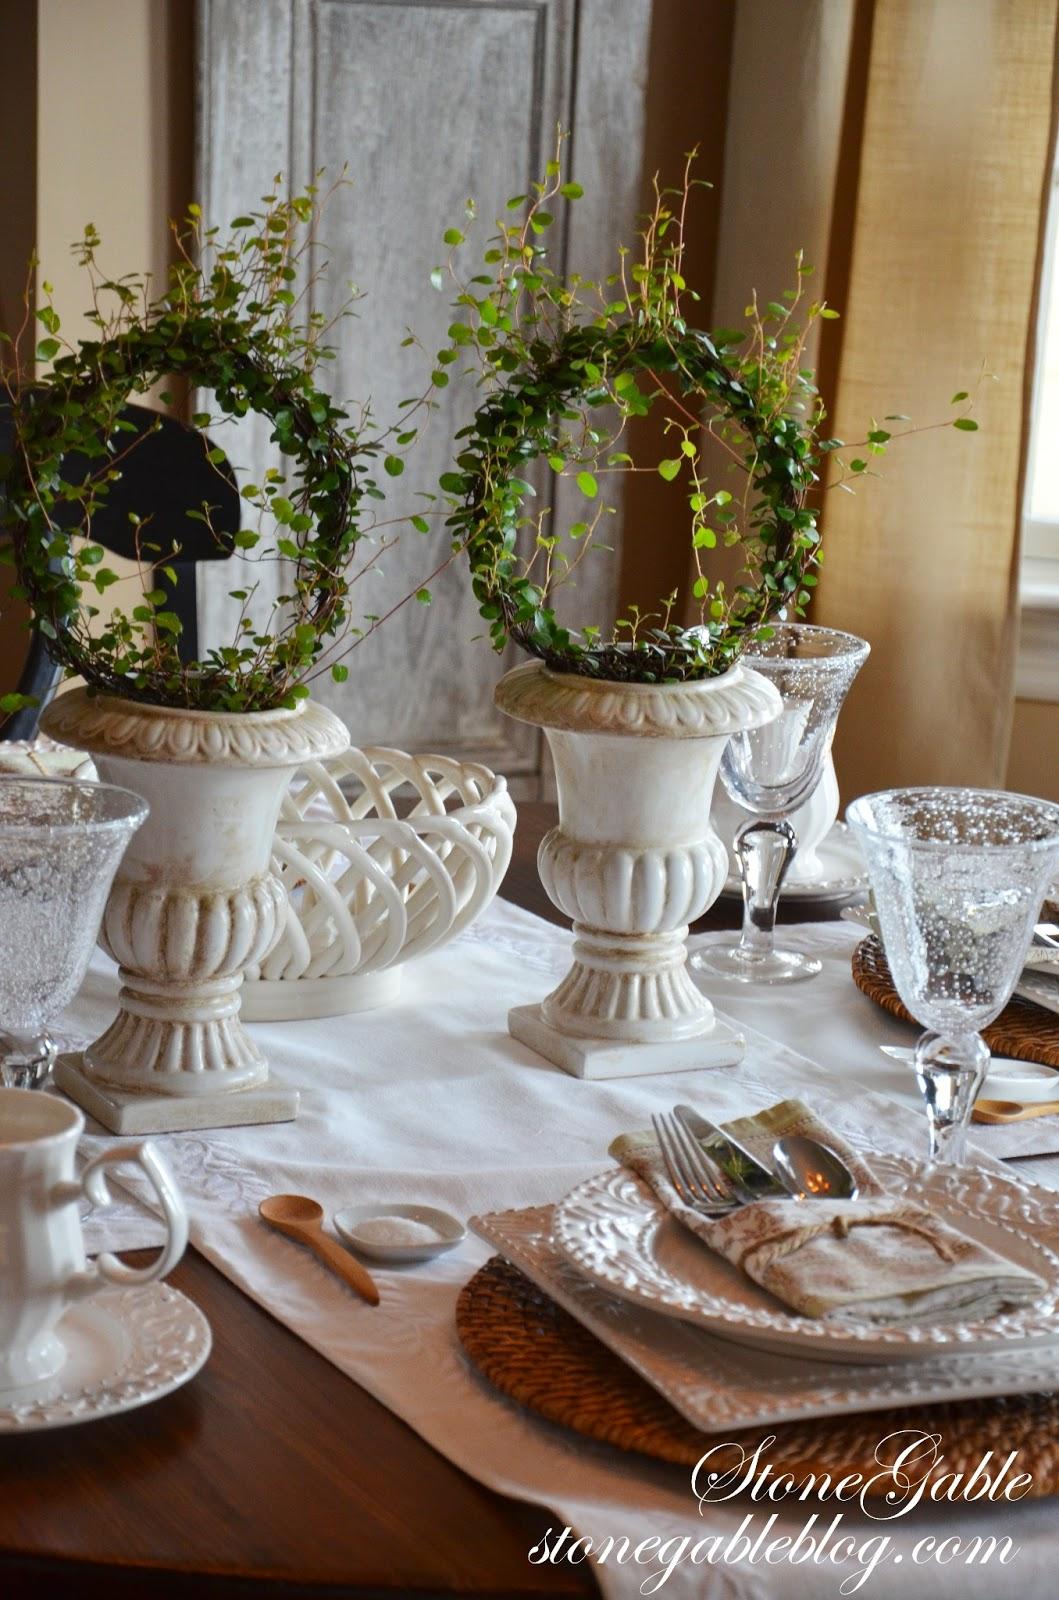 FORMULA FOR SETTING A CASUAL TABLE - StoneGable